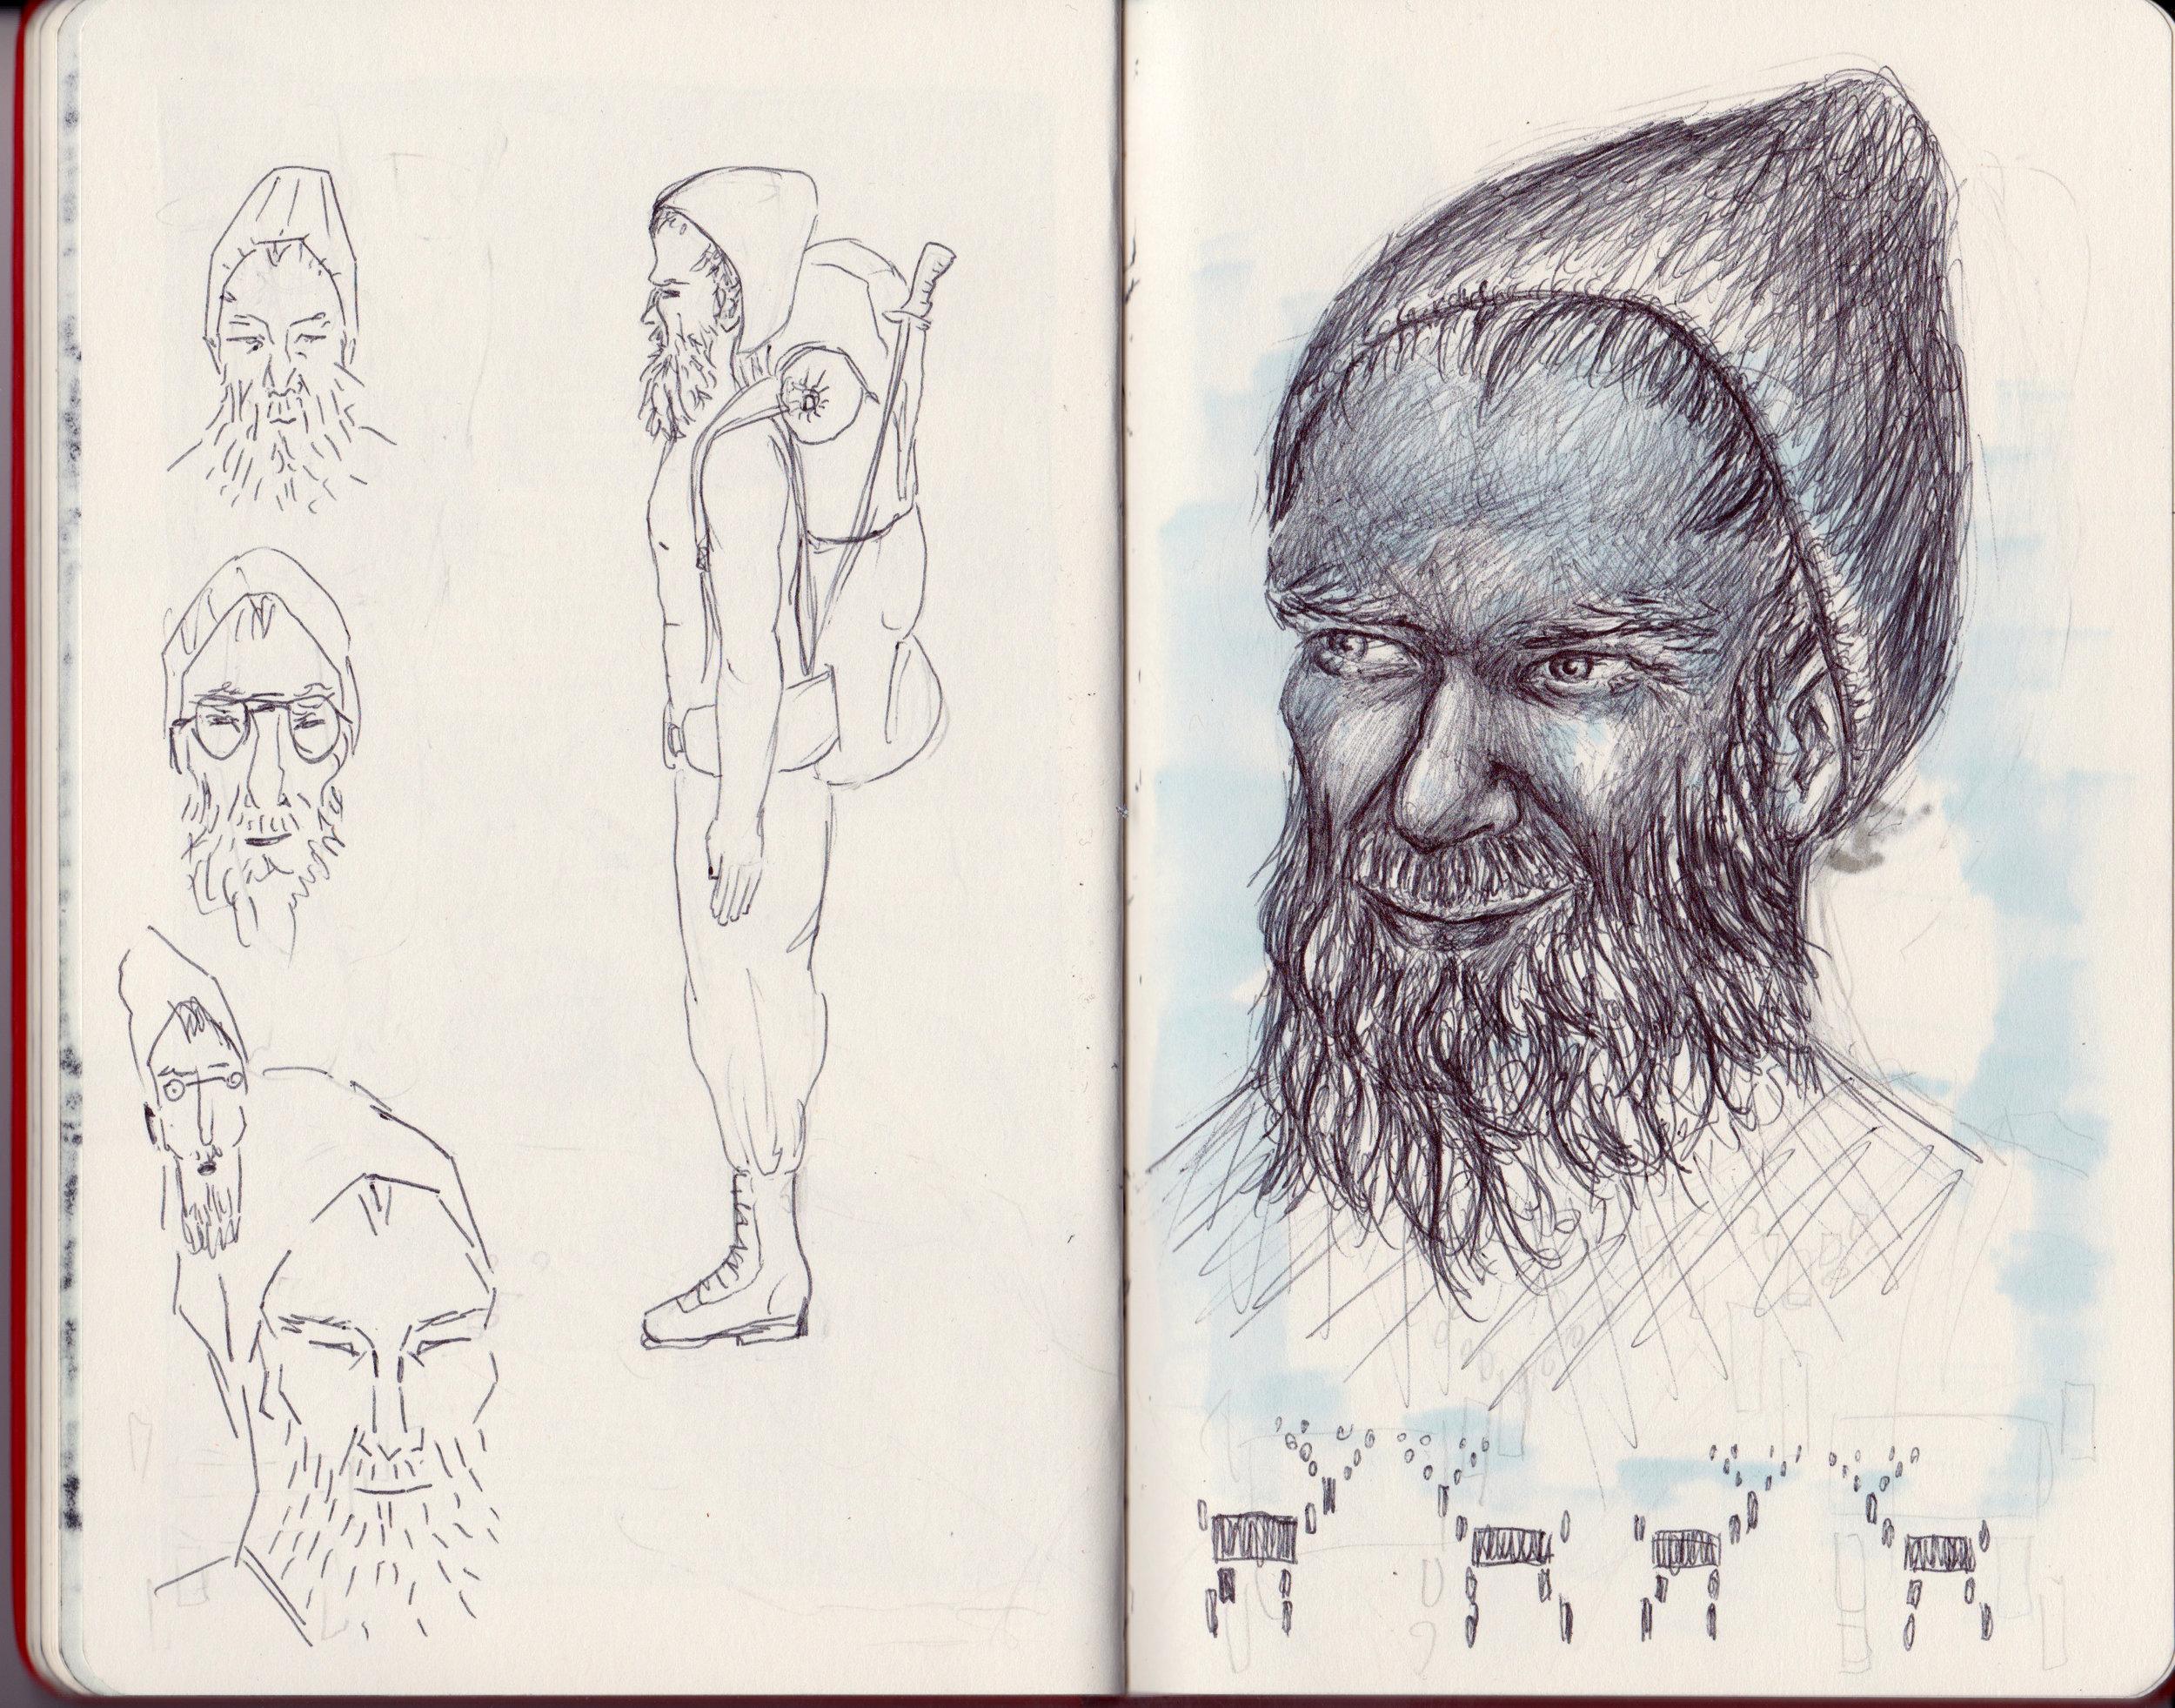 ׳inter sketch 2